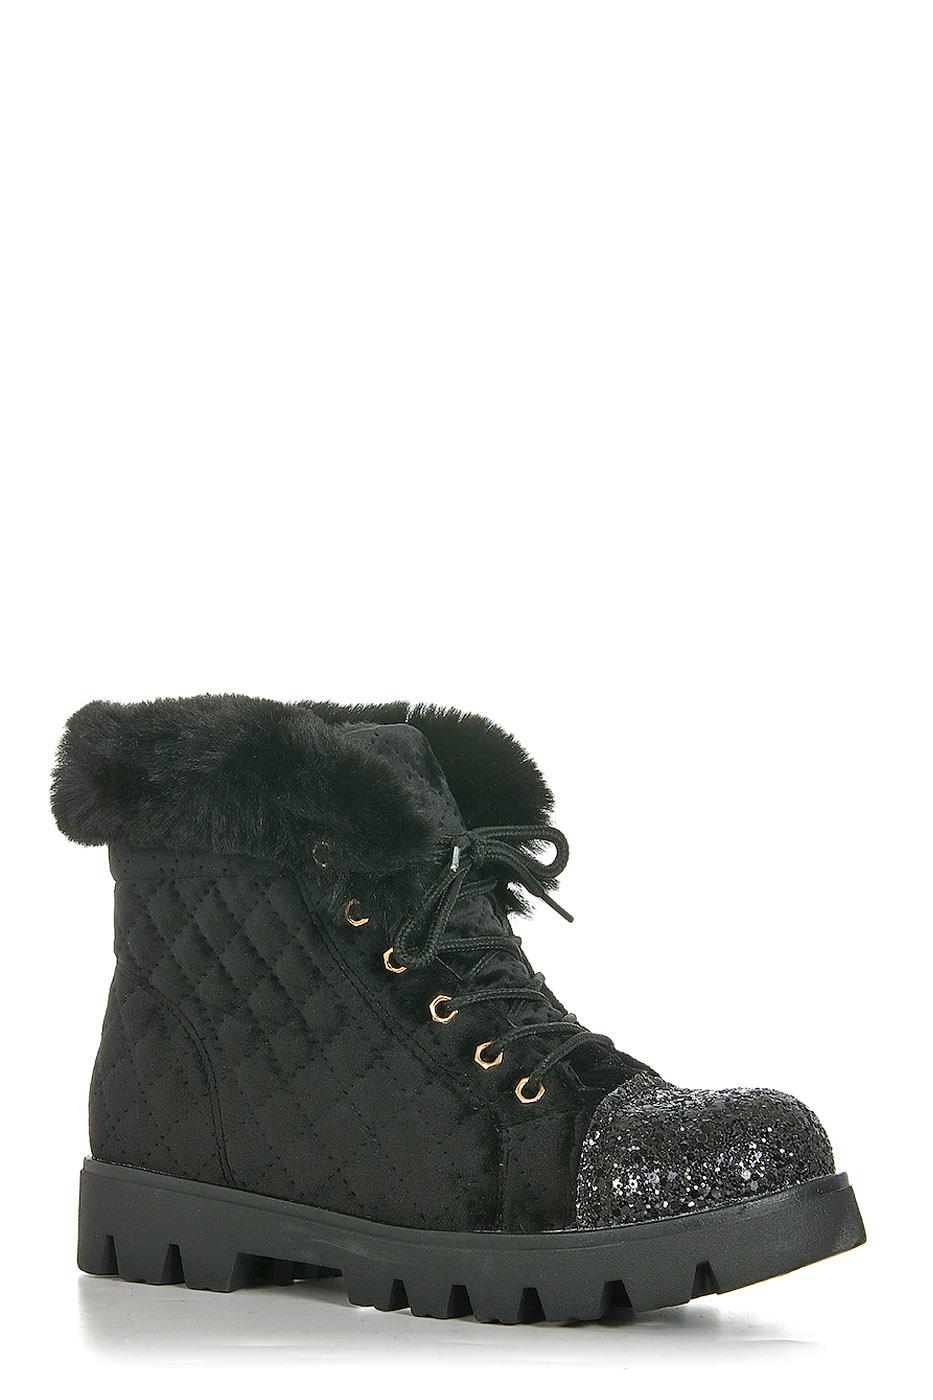 Ботинки TOPLAND2352-PB76164B/BLACK